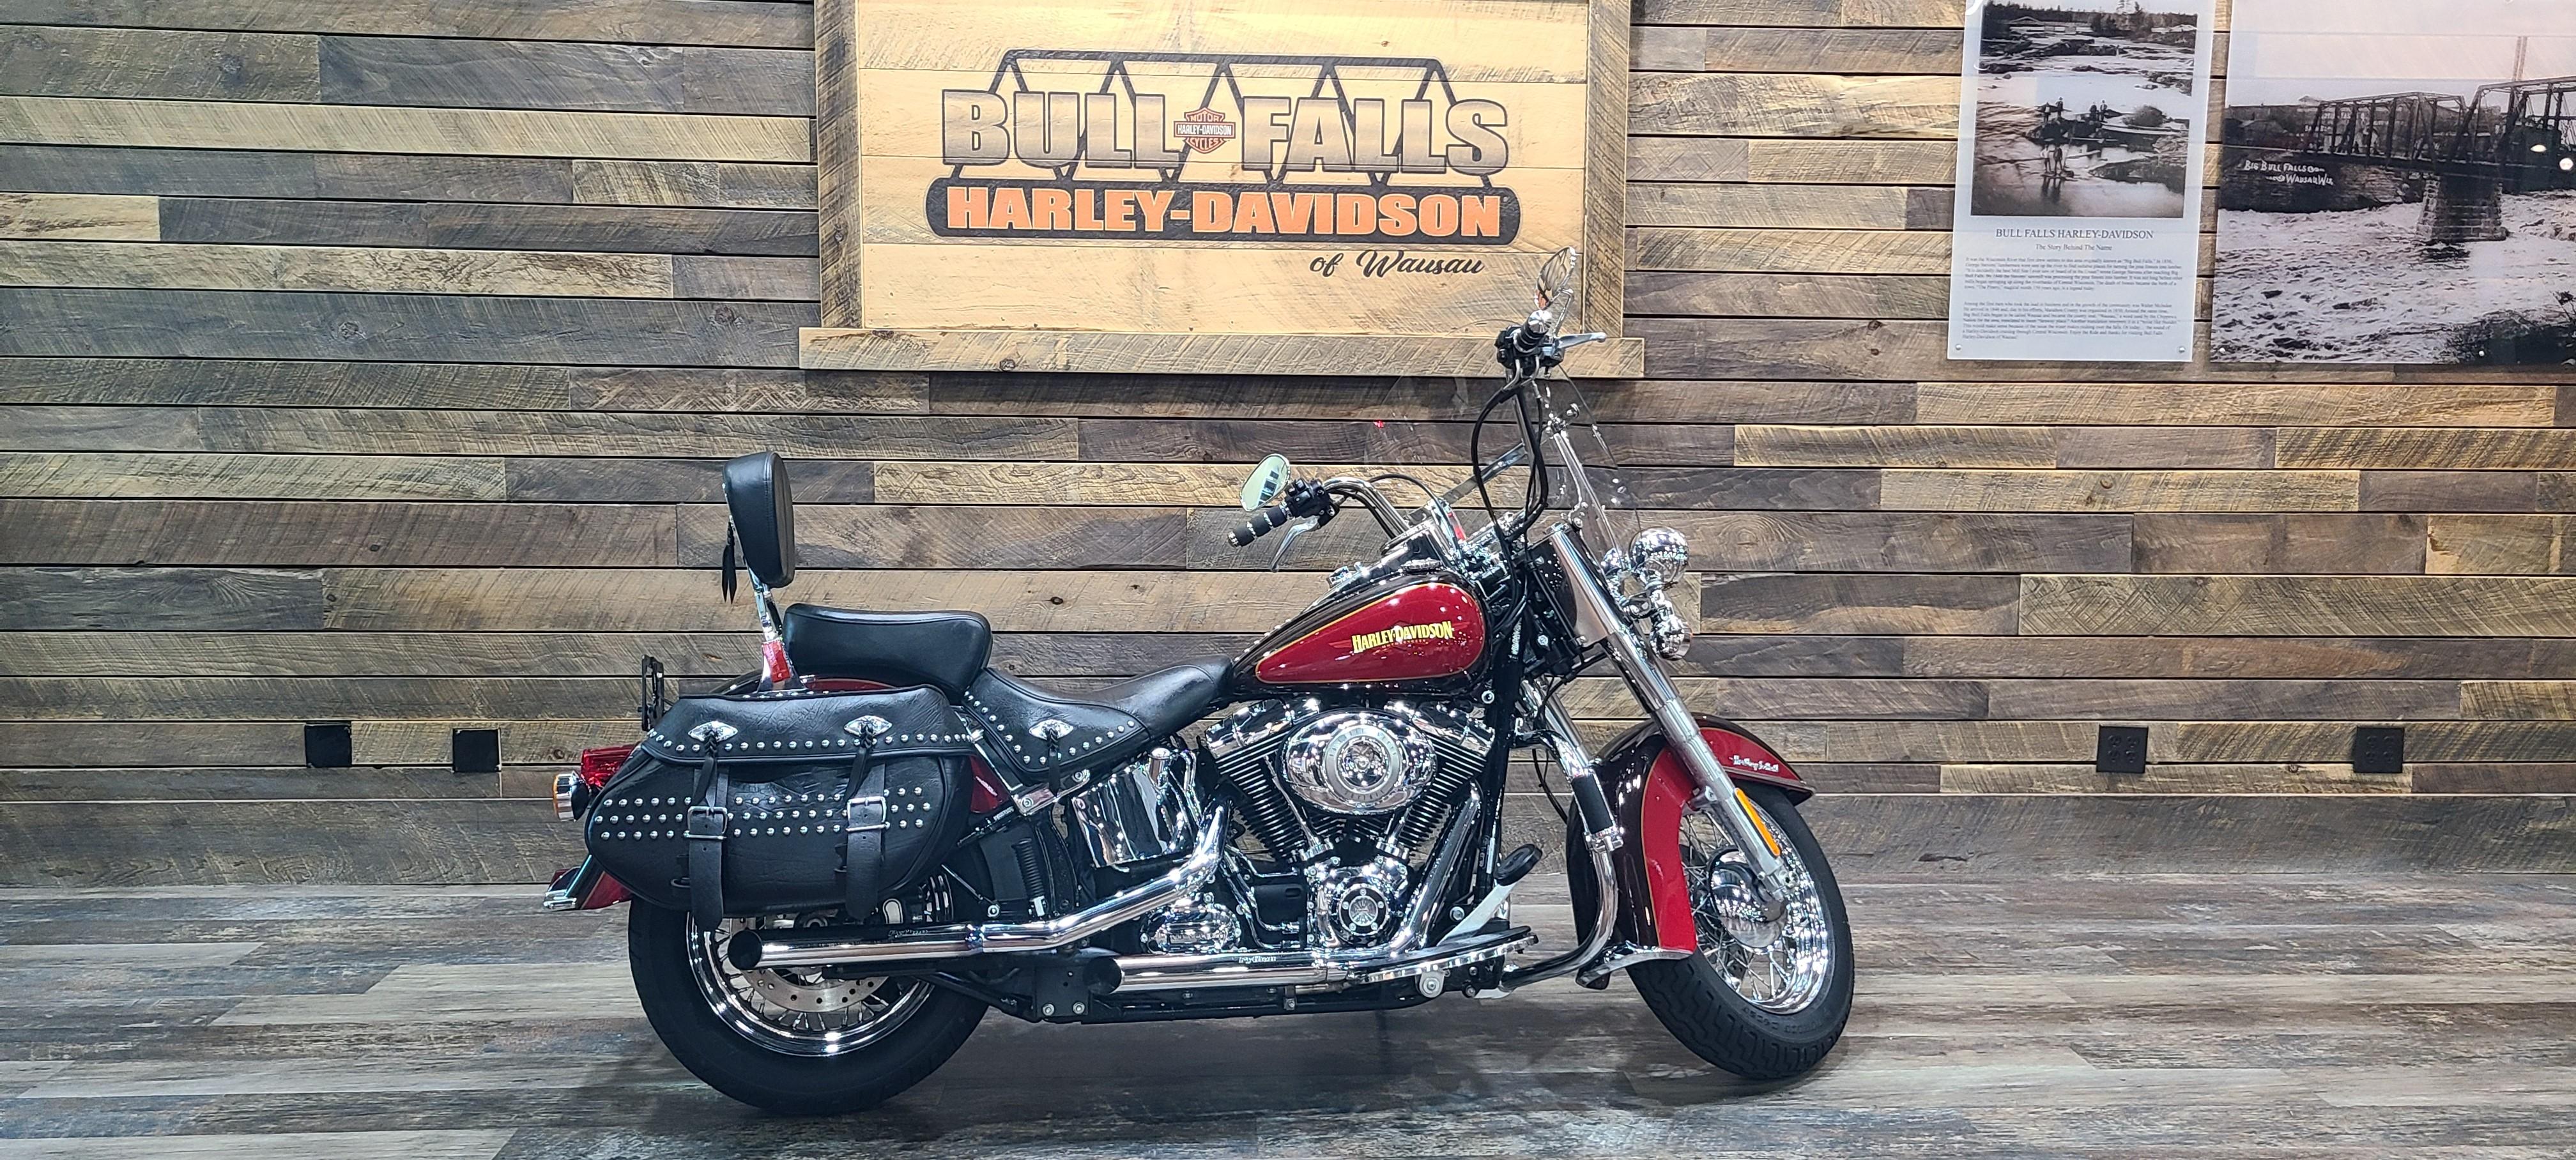 2010 Harley-Davidson Softail Heritage Softail Classic at Bull Falls Harley-Davidson